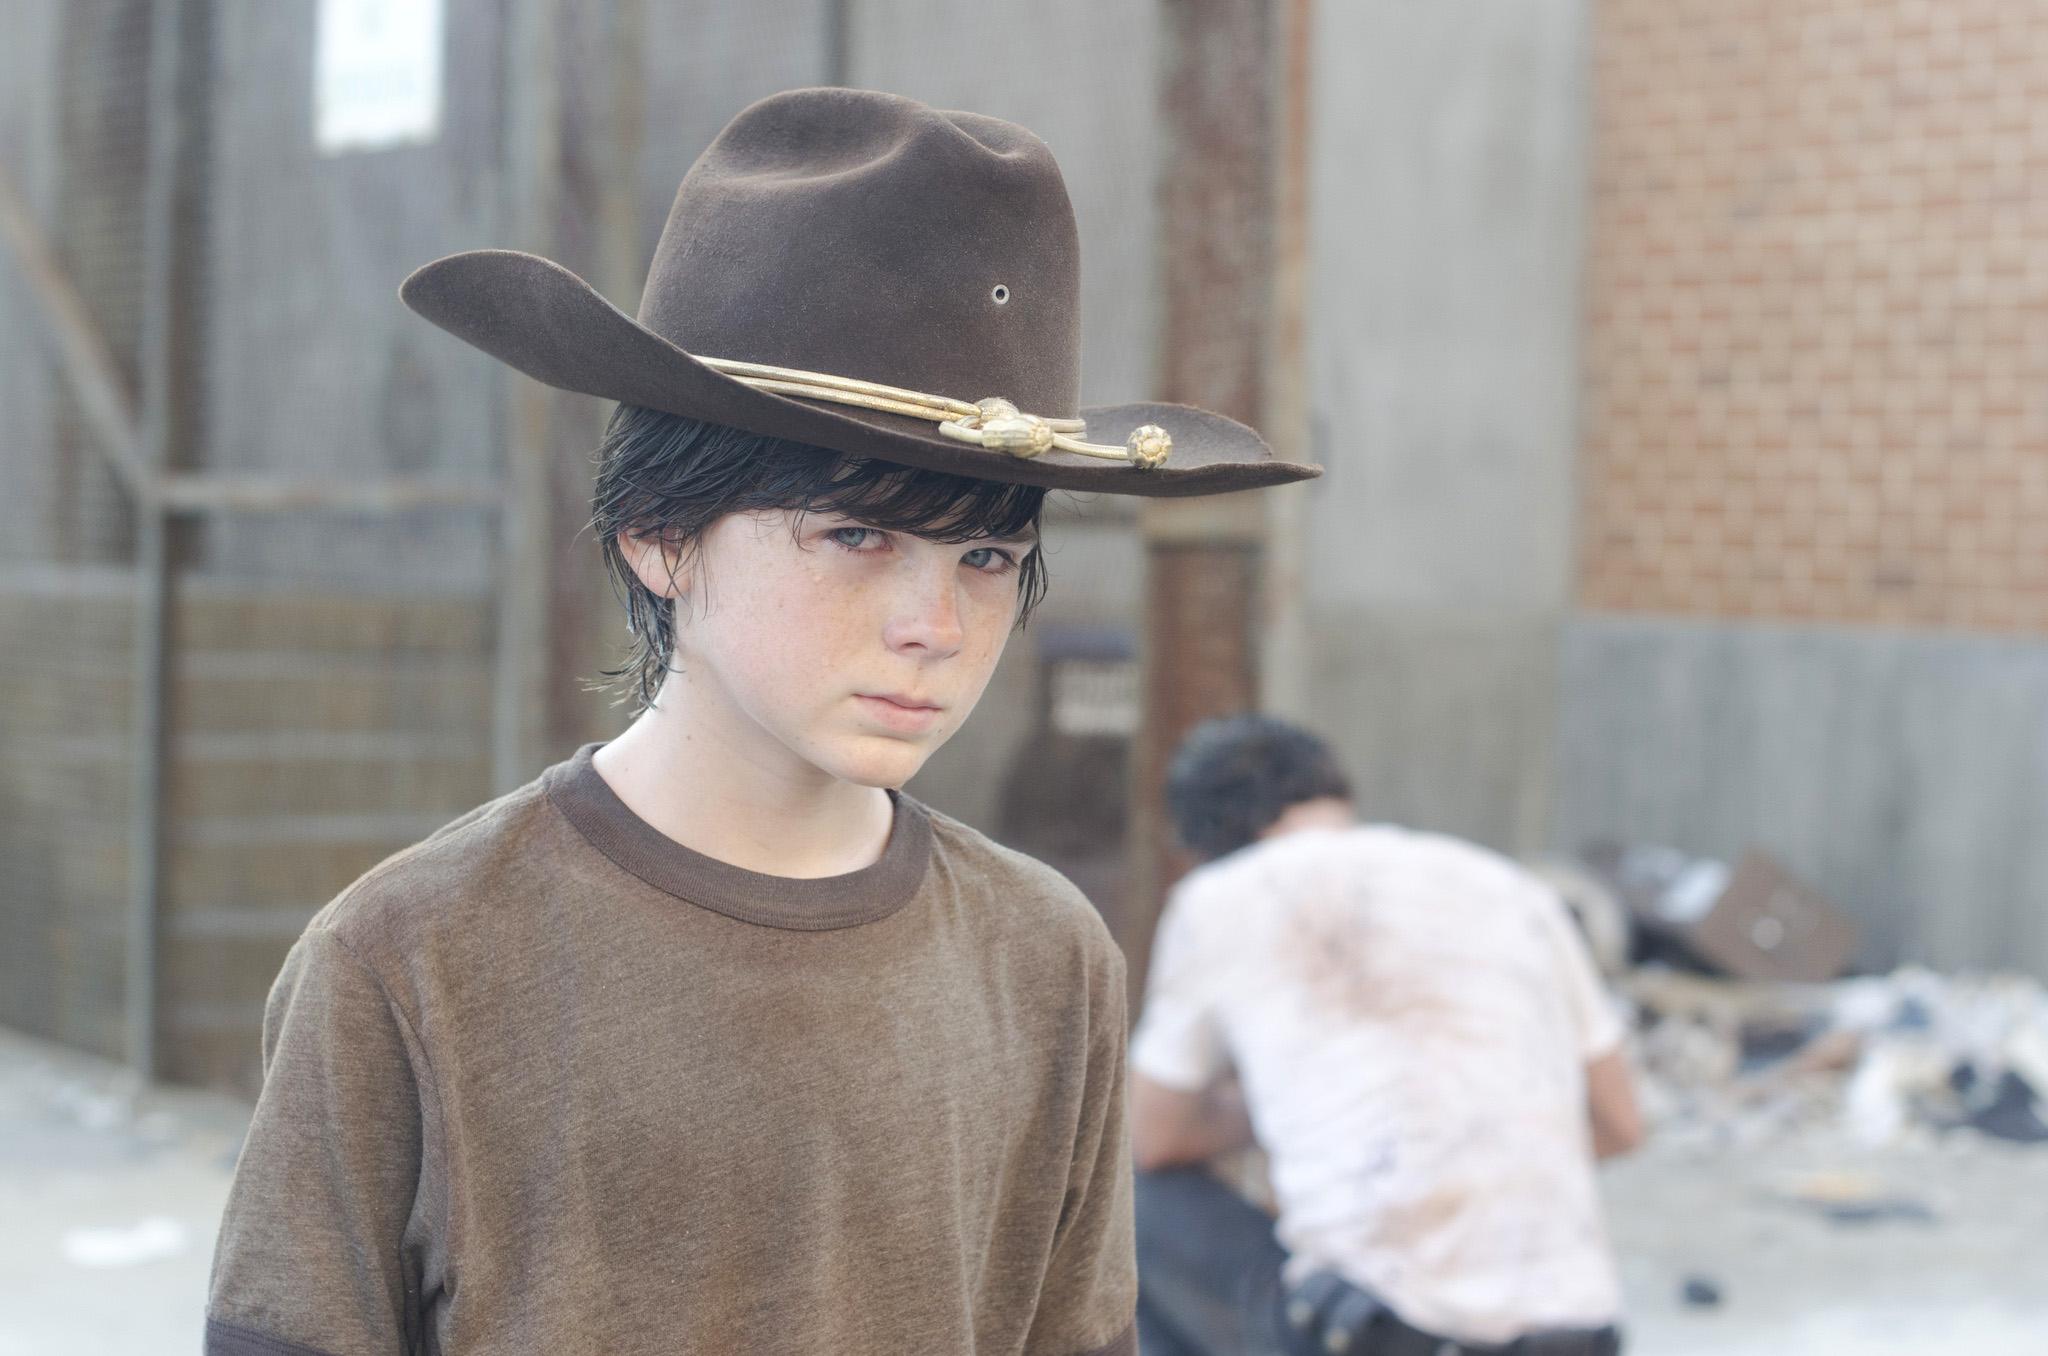 Consequências de The Walking Dead: Perguntas e Teorias pós episódio 3x04 -